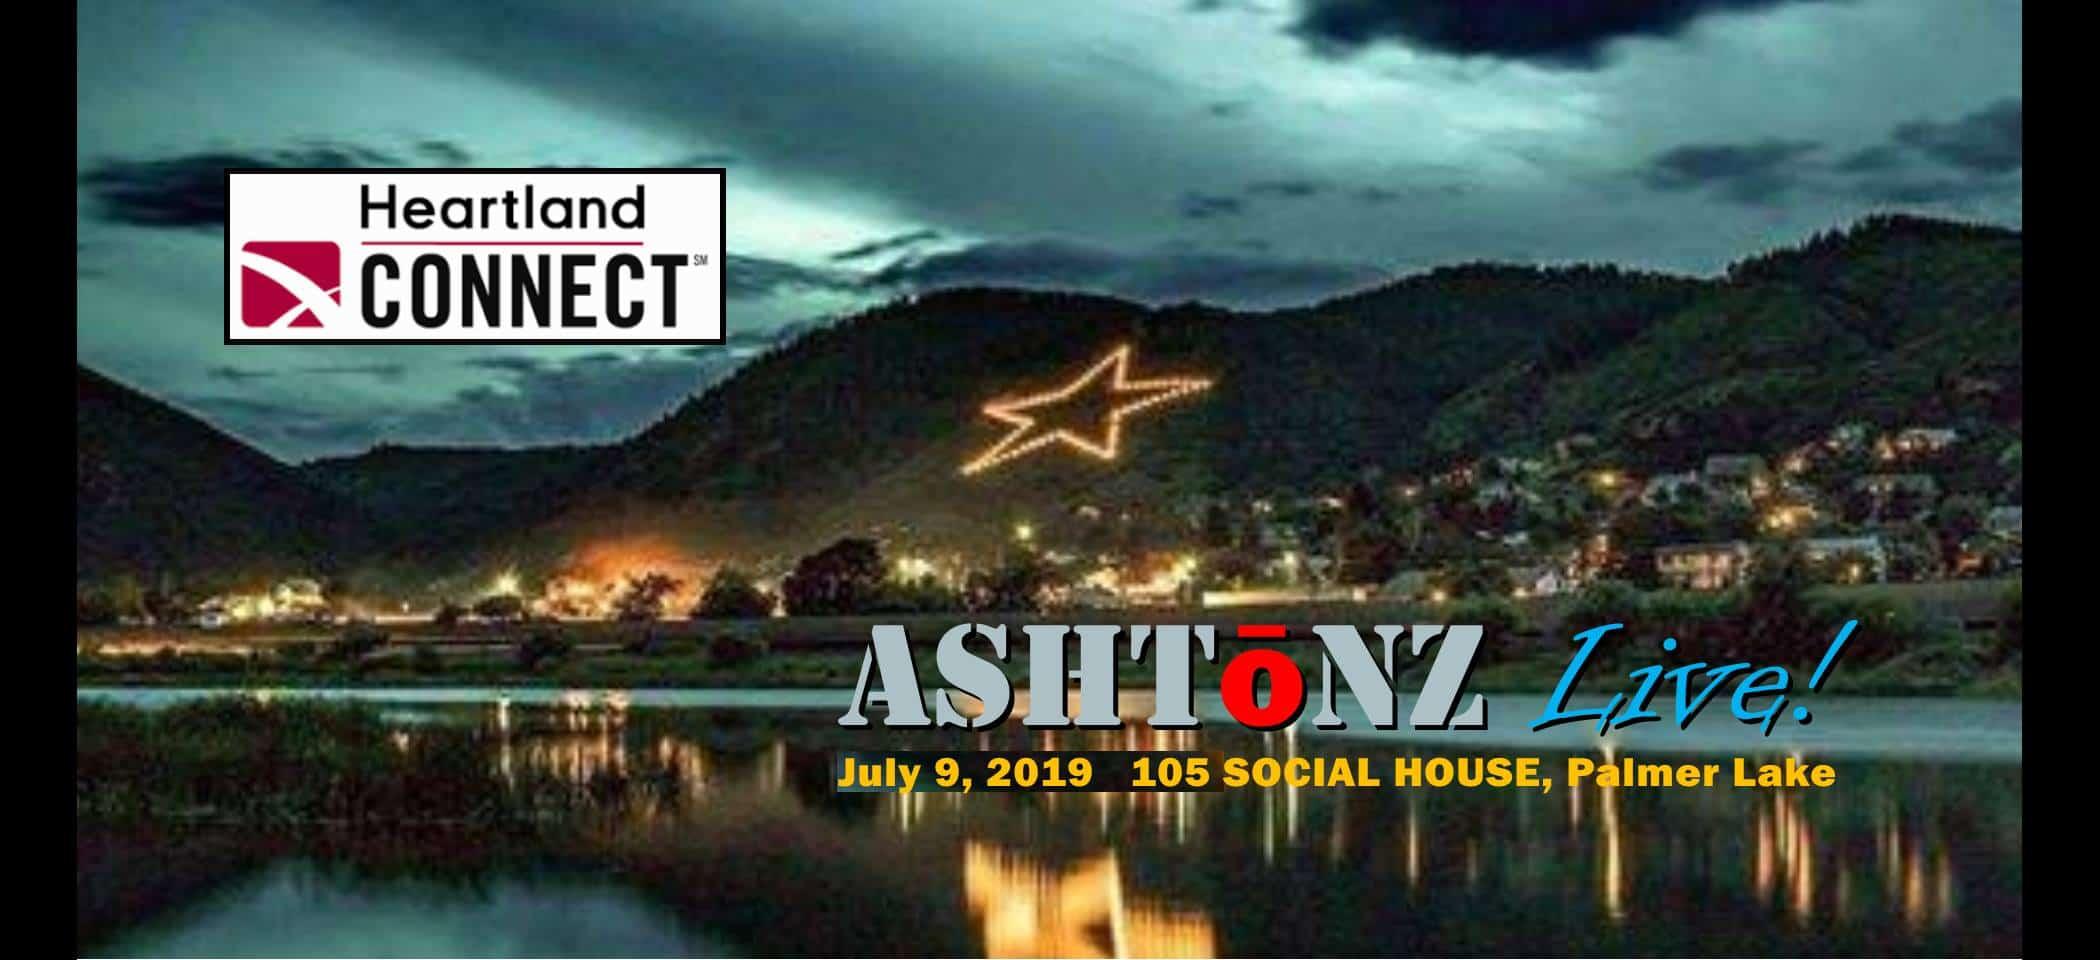 Ashtonz at Heartland Connect